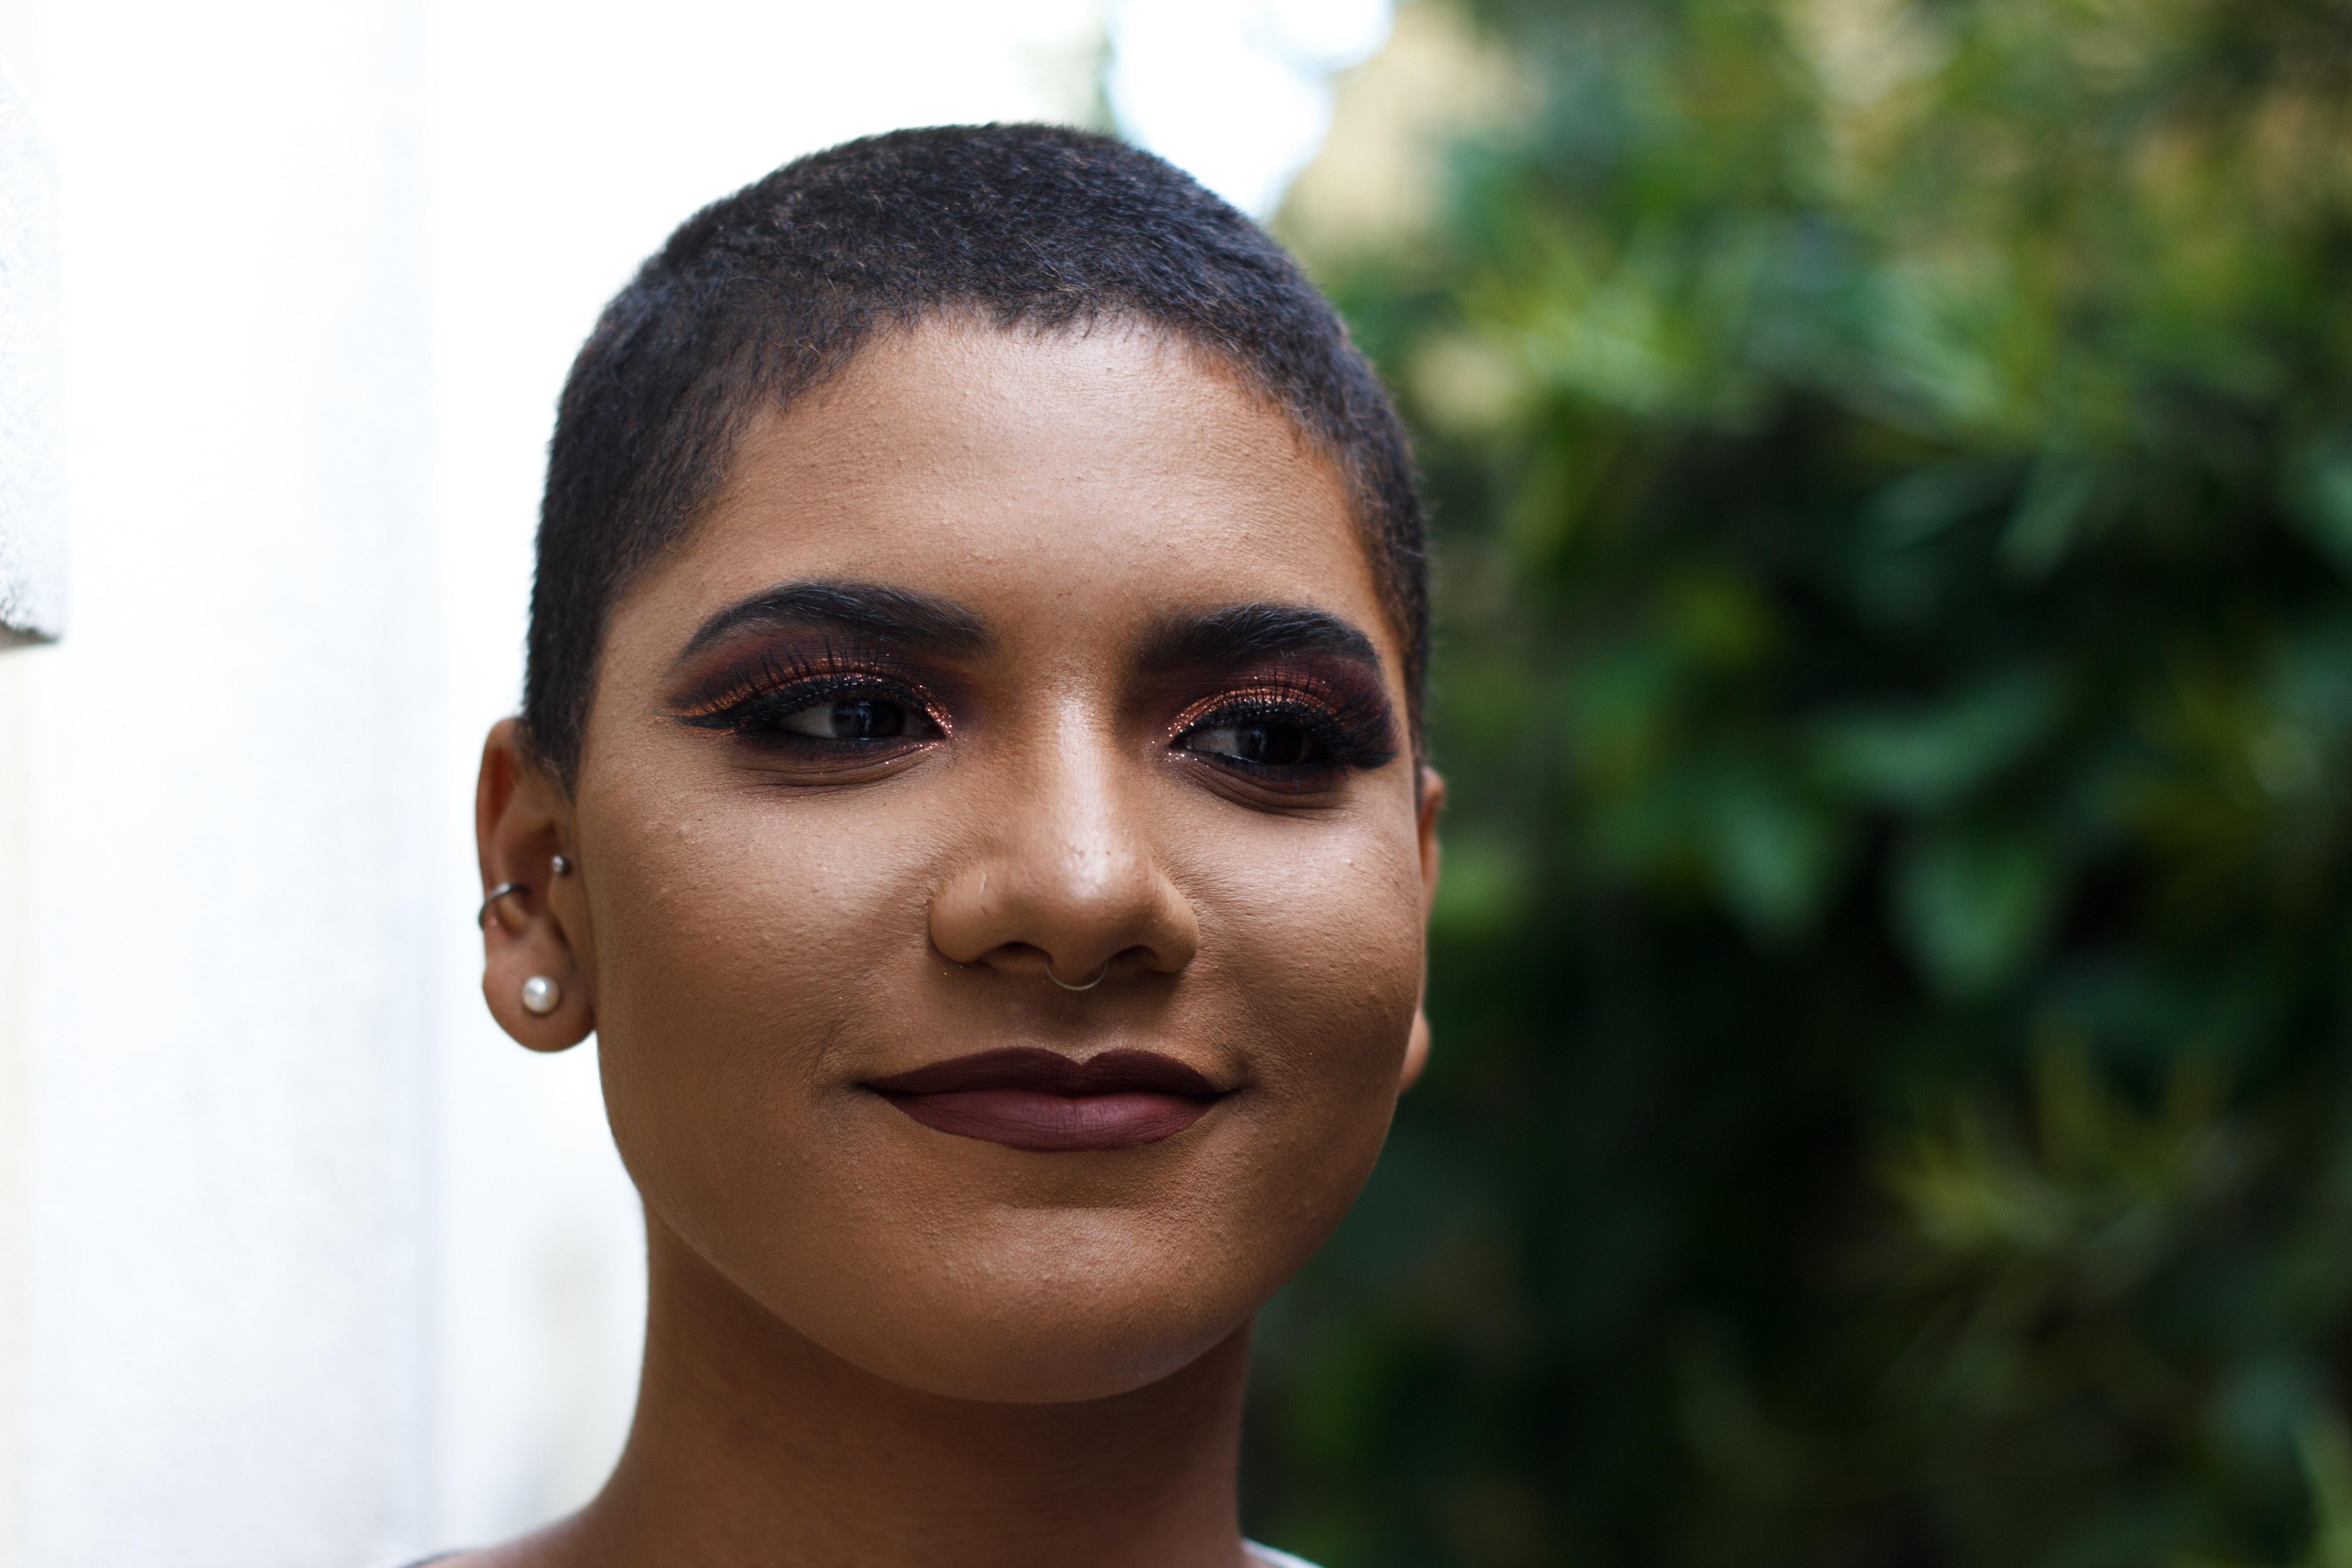 Woman's face photo